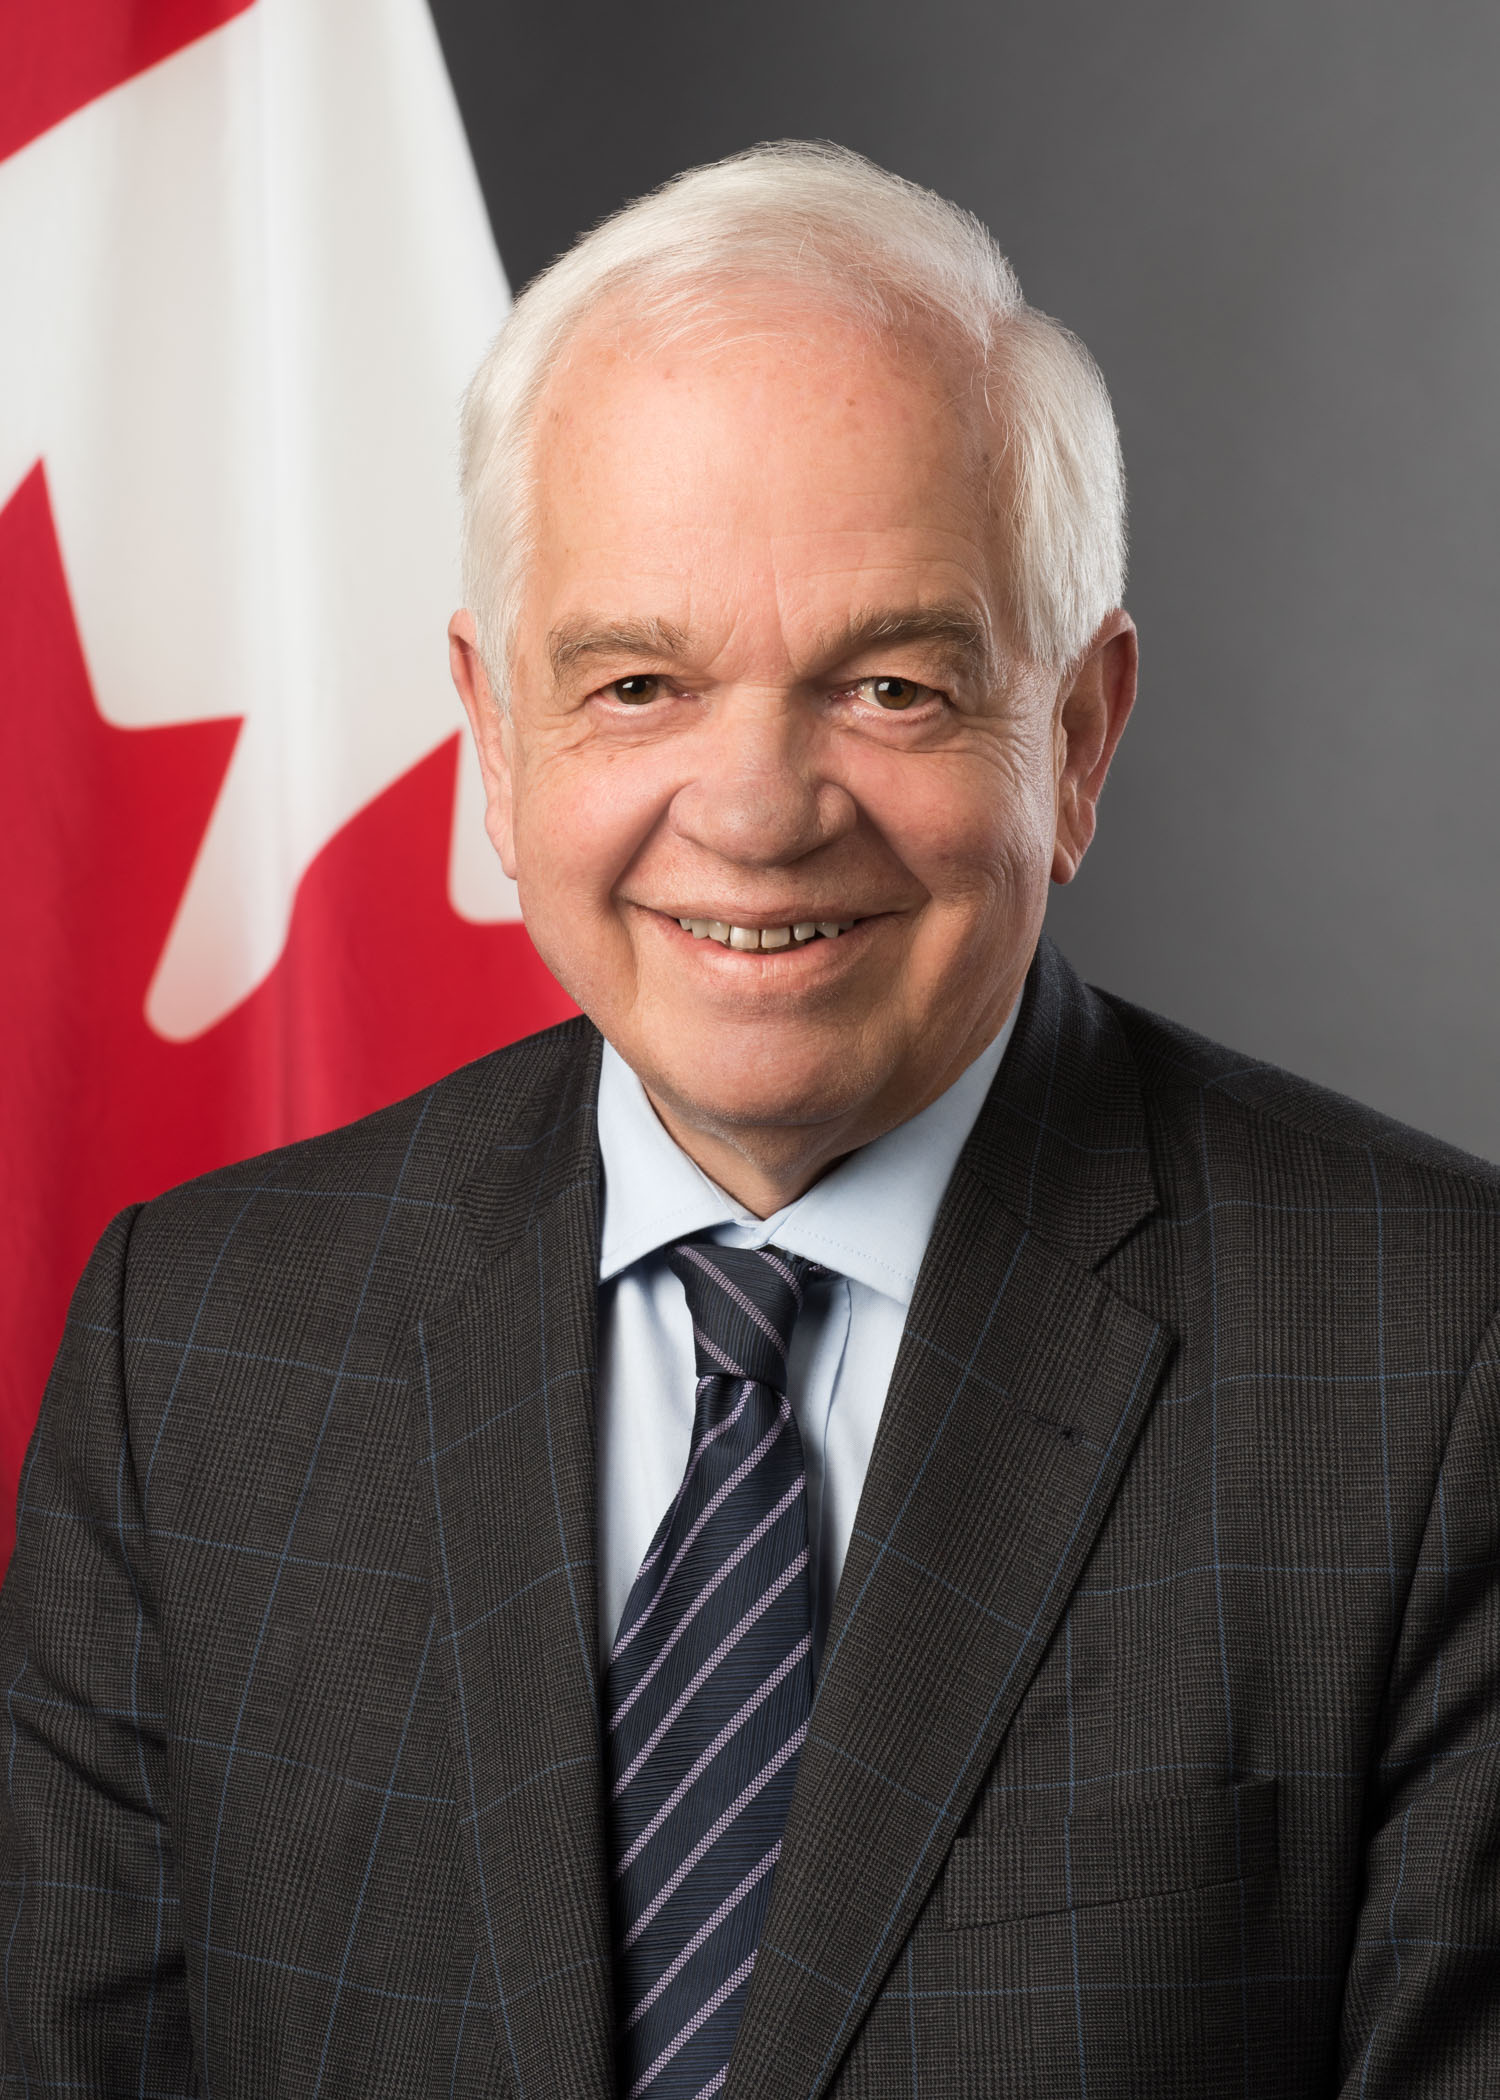 Former Canadian ambassador to China, John McCallum